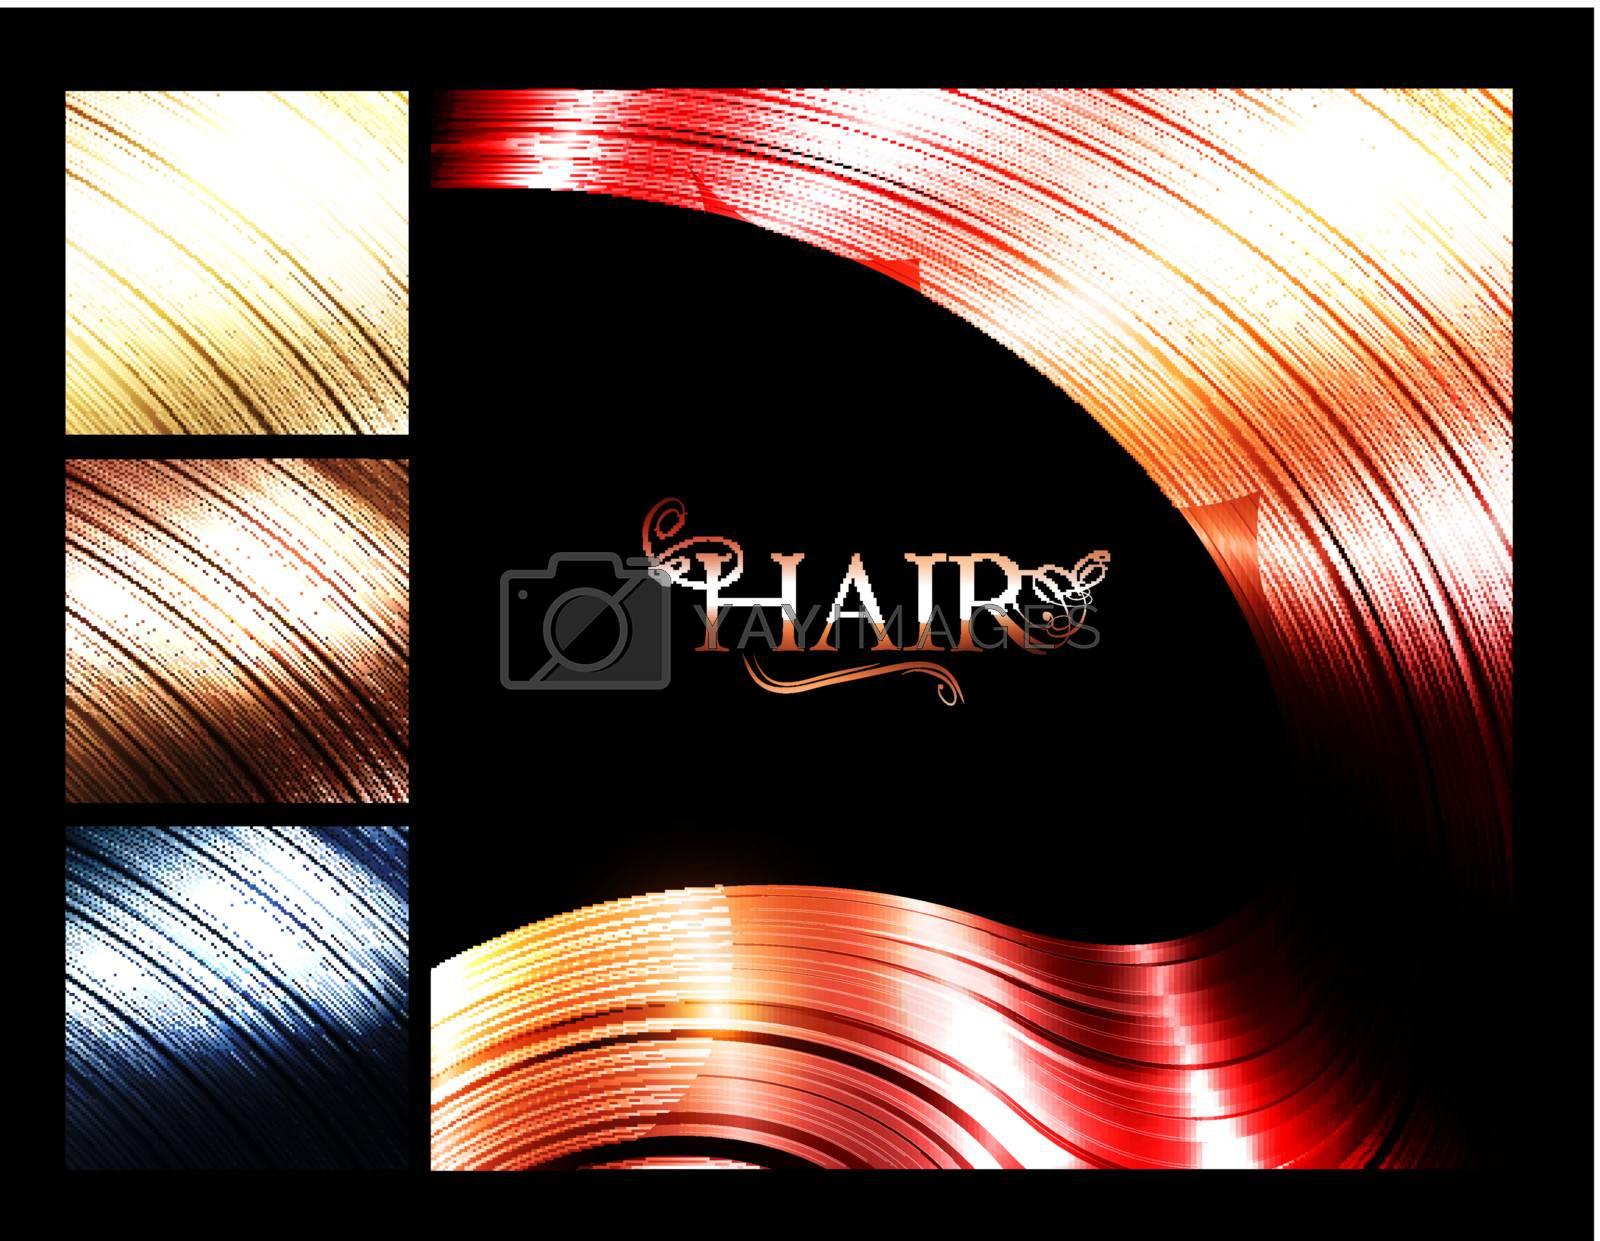 Hair palette banners over dark background